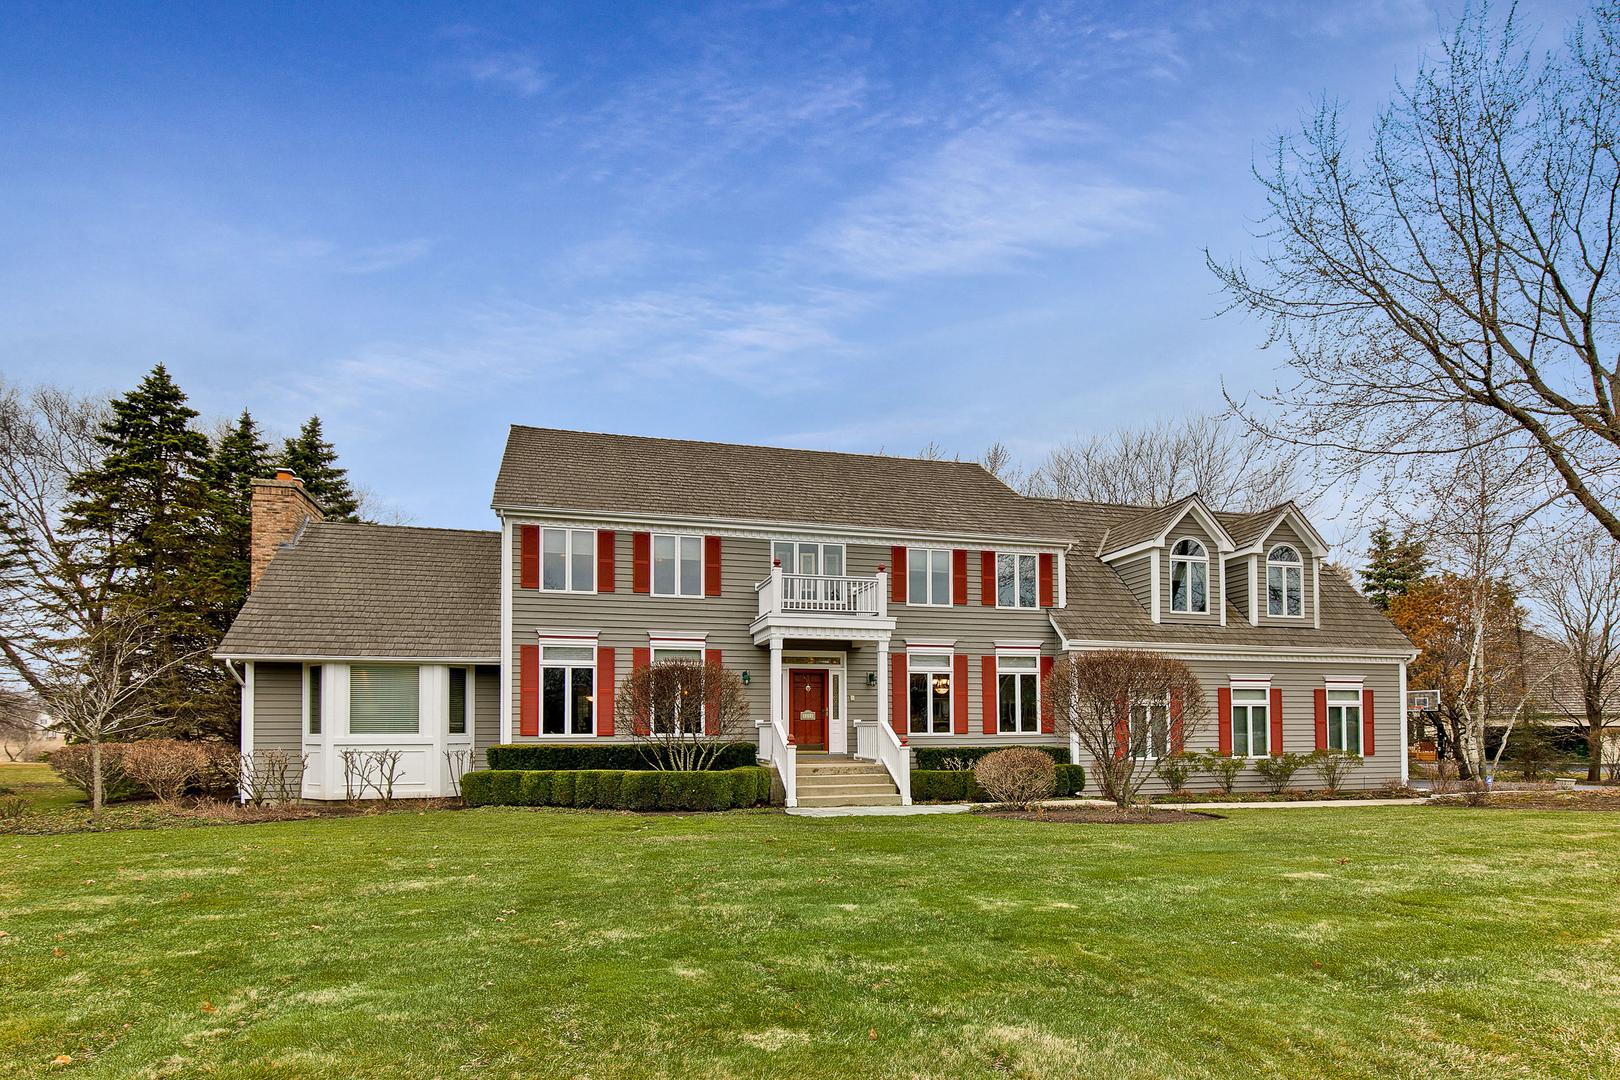 5252 Hilltop Road, Long Grove, Illinois 60047